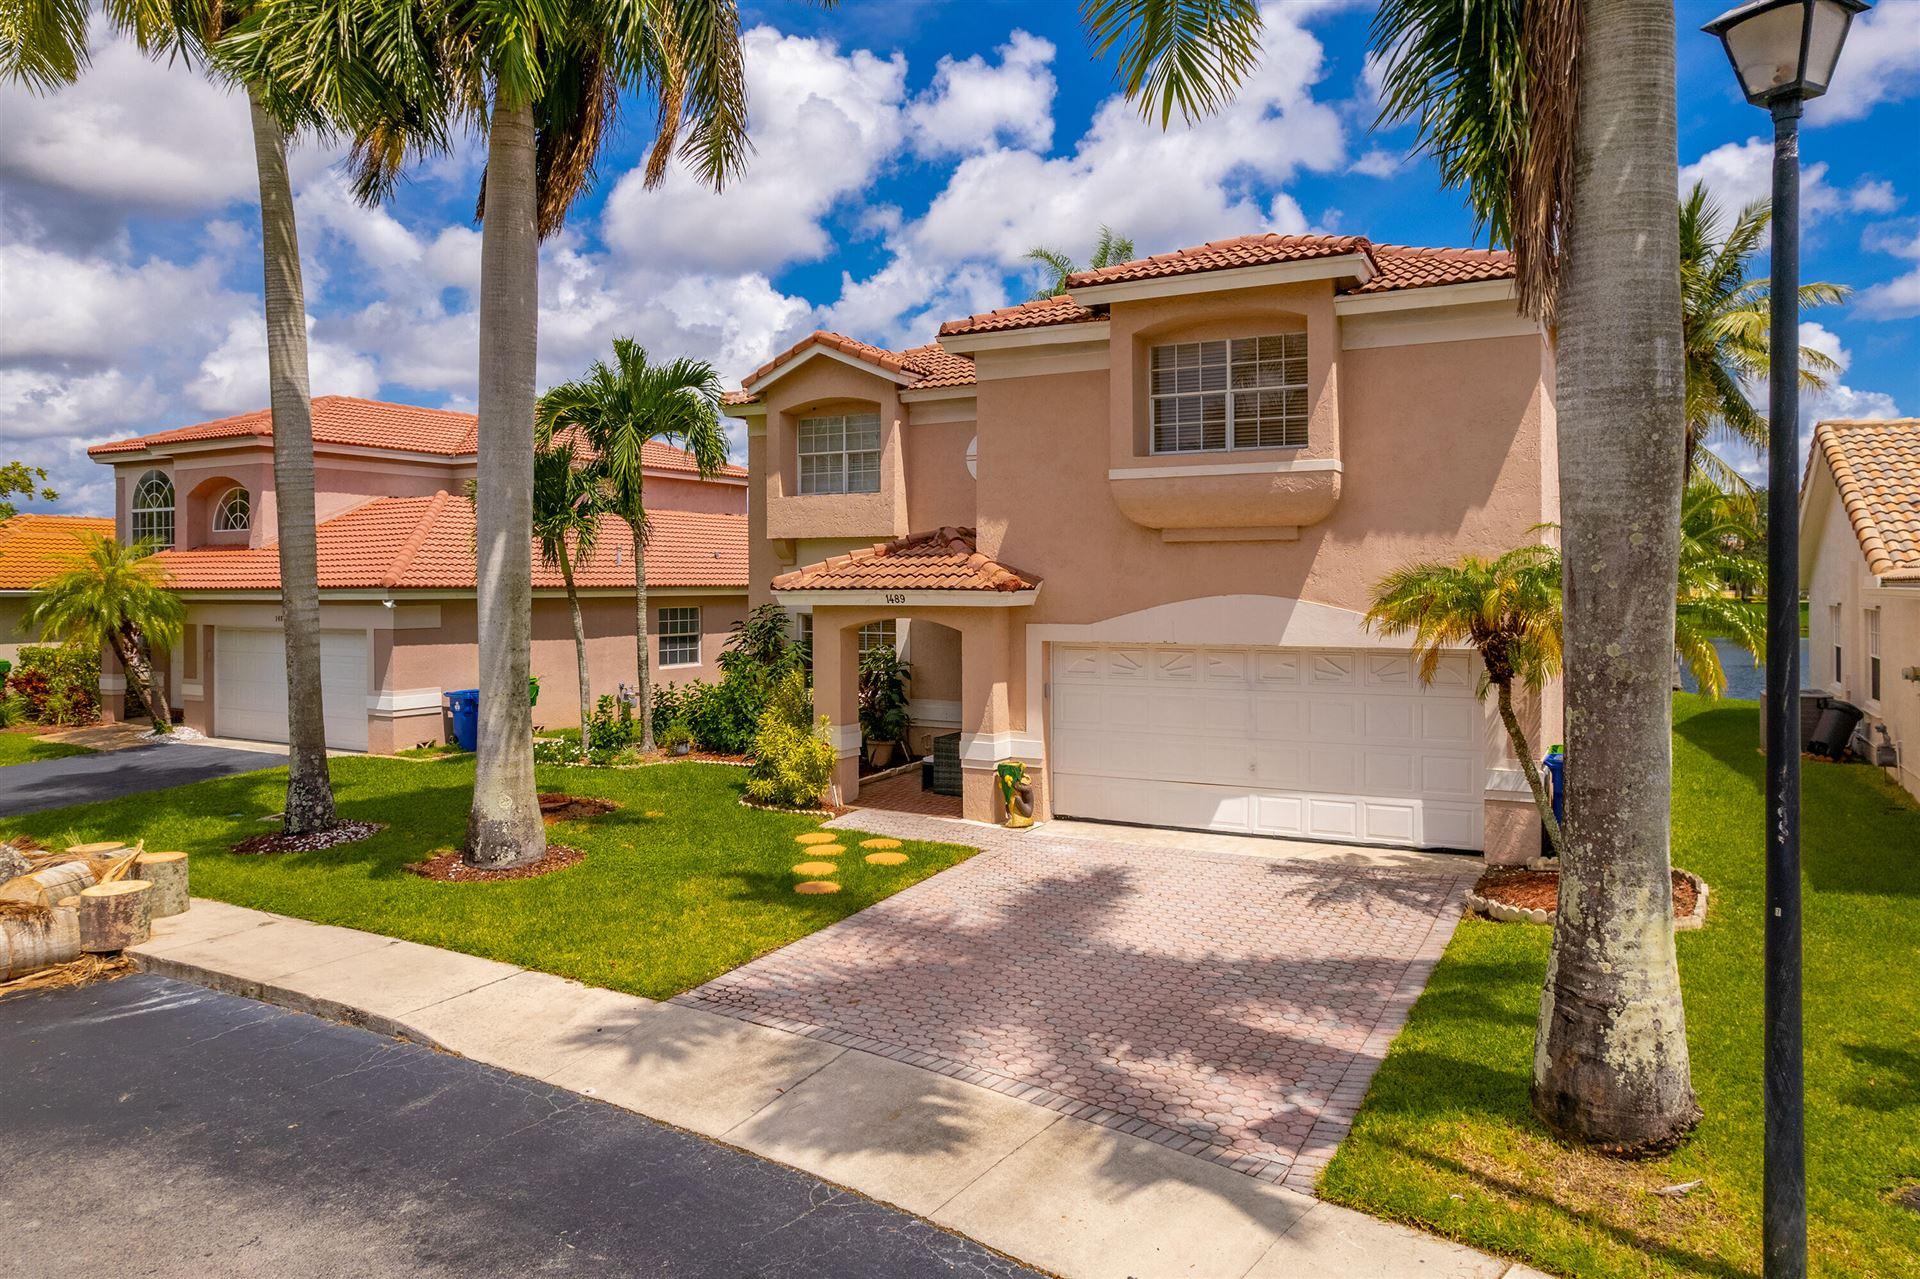 1489 NW 129 Way, Sunrise, FL 33323 - MLS#: RX-10746250